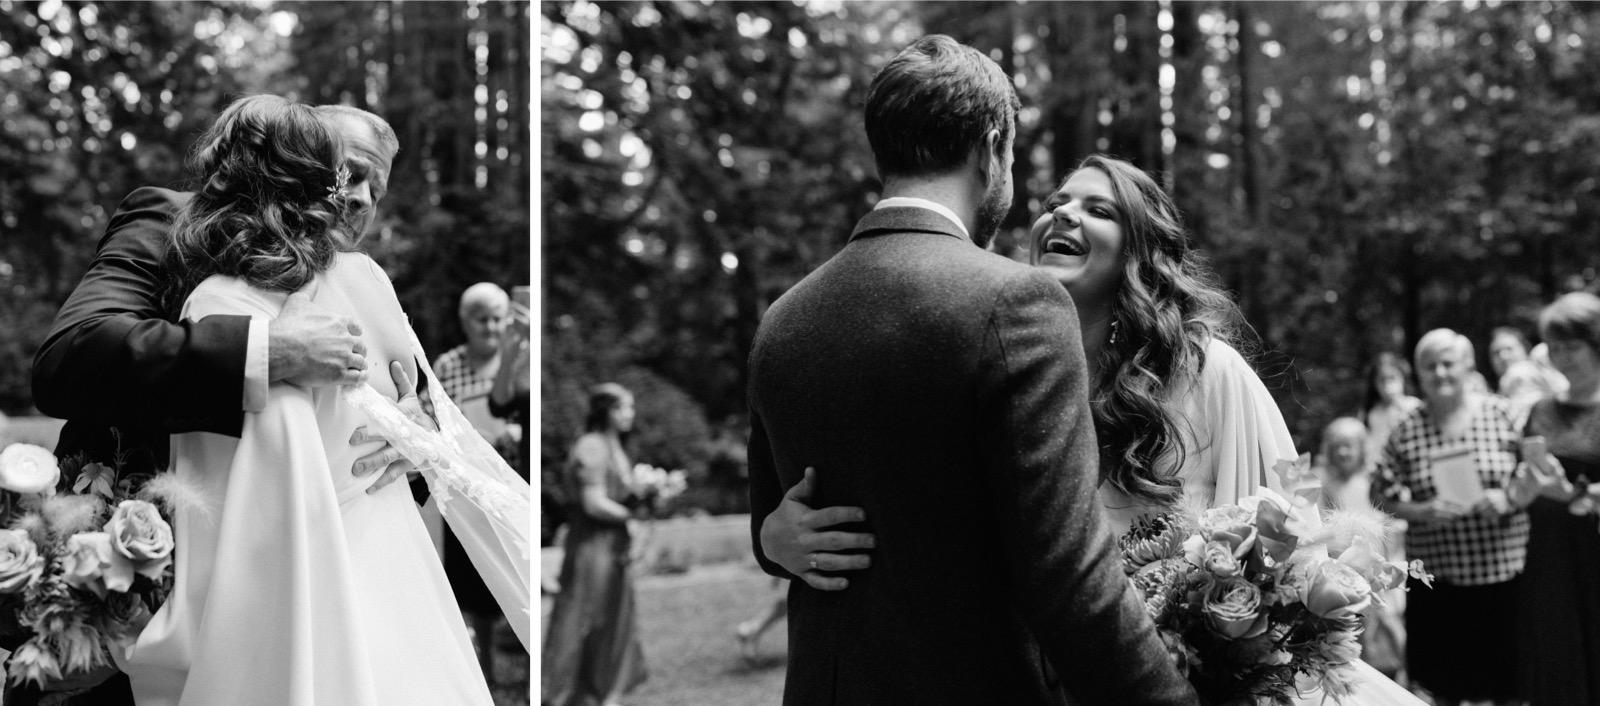 060_Emily & Jeff Wedding 0607_Emily & Jeff Wedding 0606_the-waterfall-lodge_forest_wedding_ben-lomond_intimate